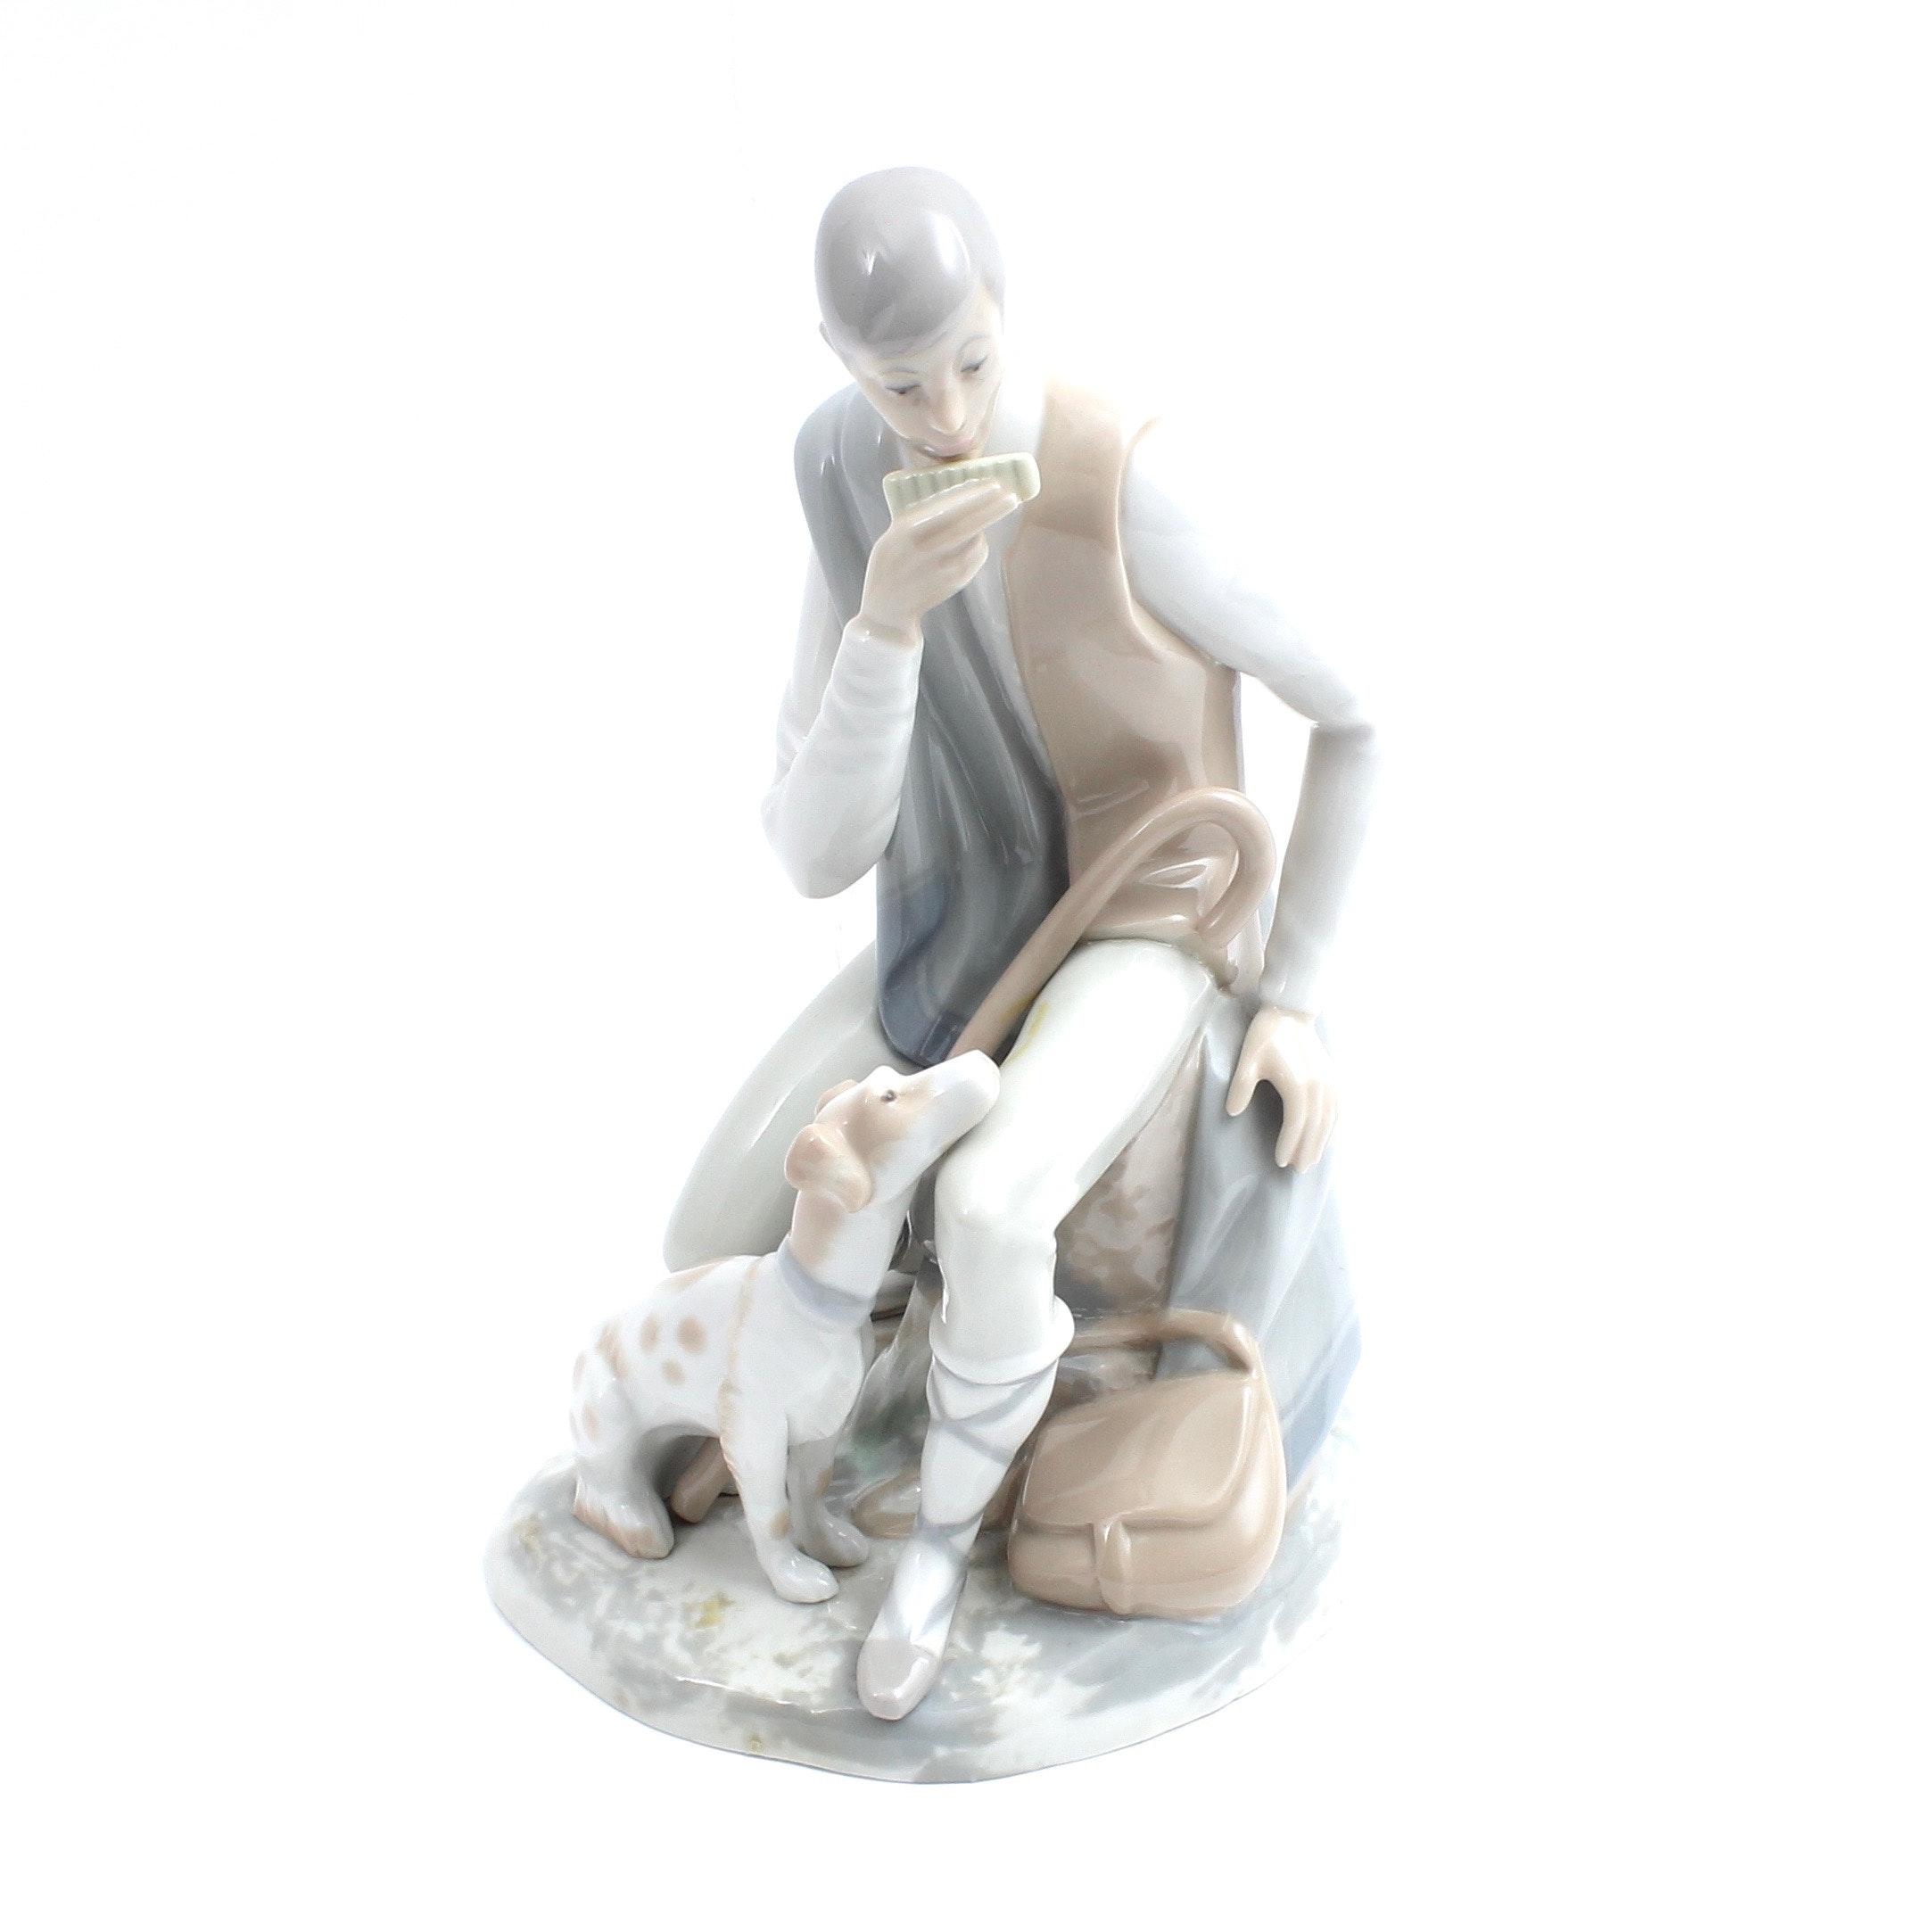 Spanish Porcelain Figurine of Shepherd with Harmonica